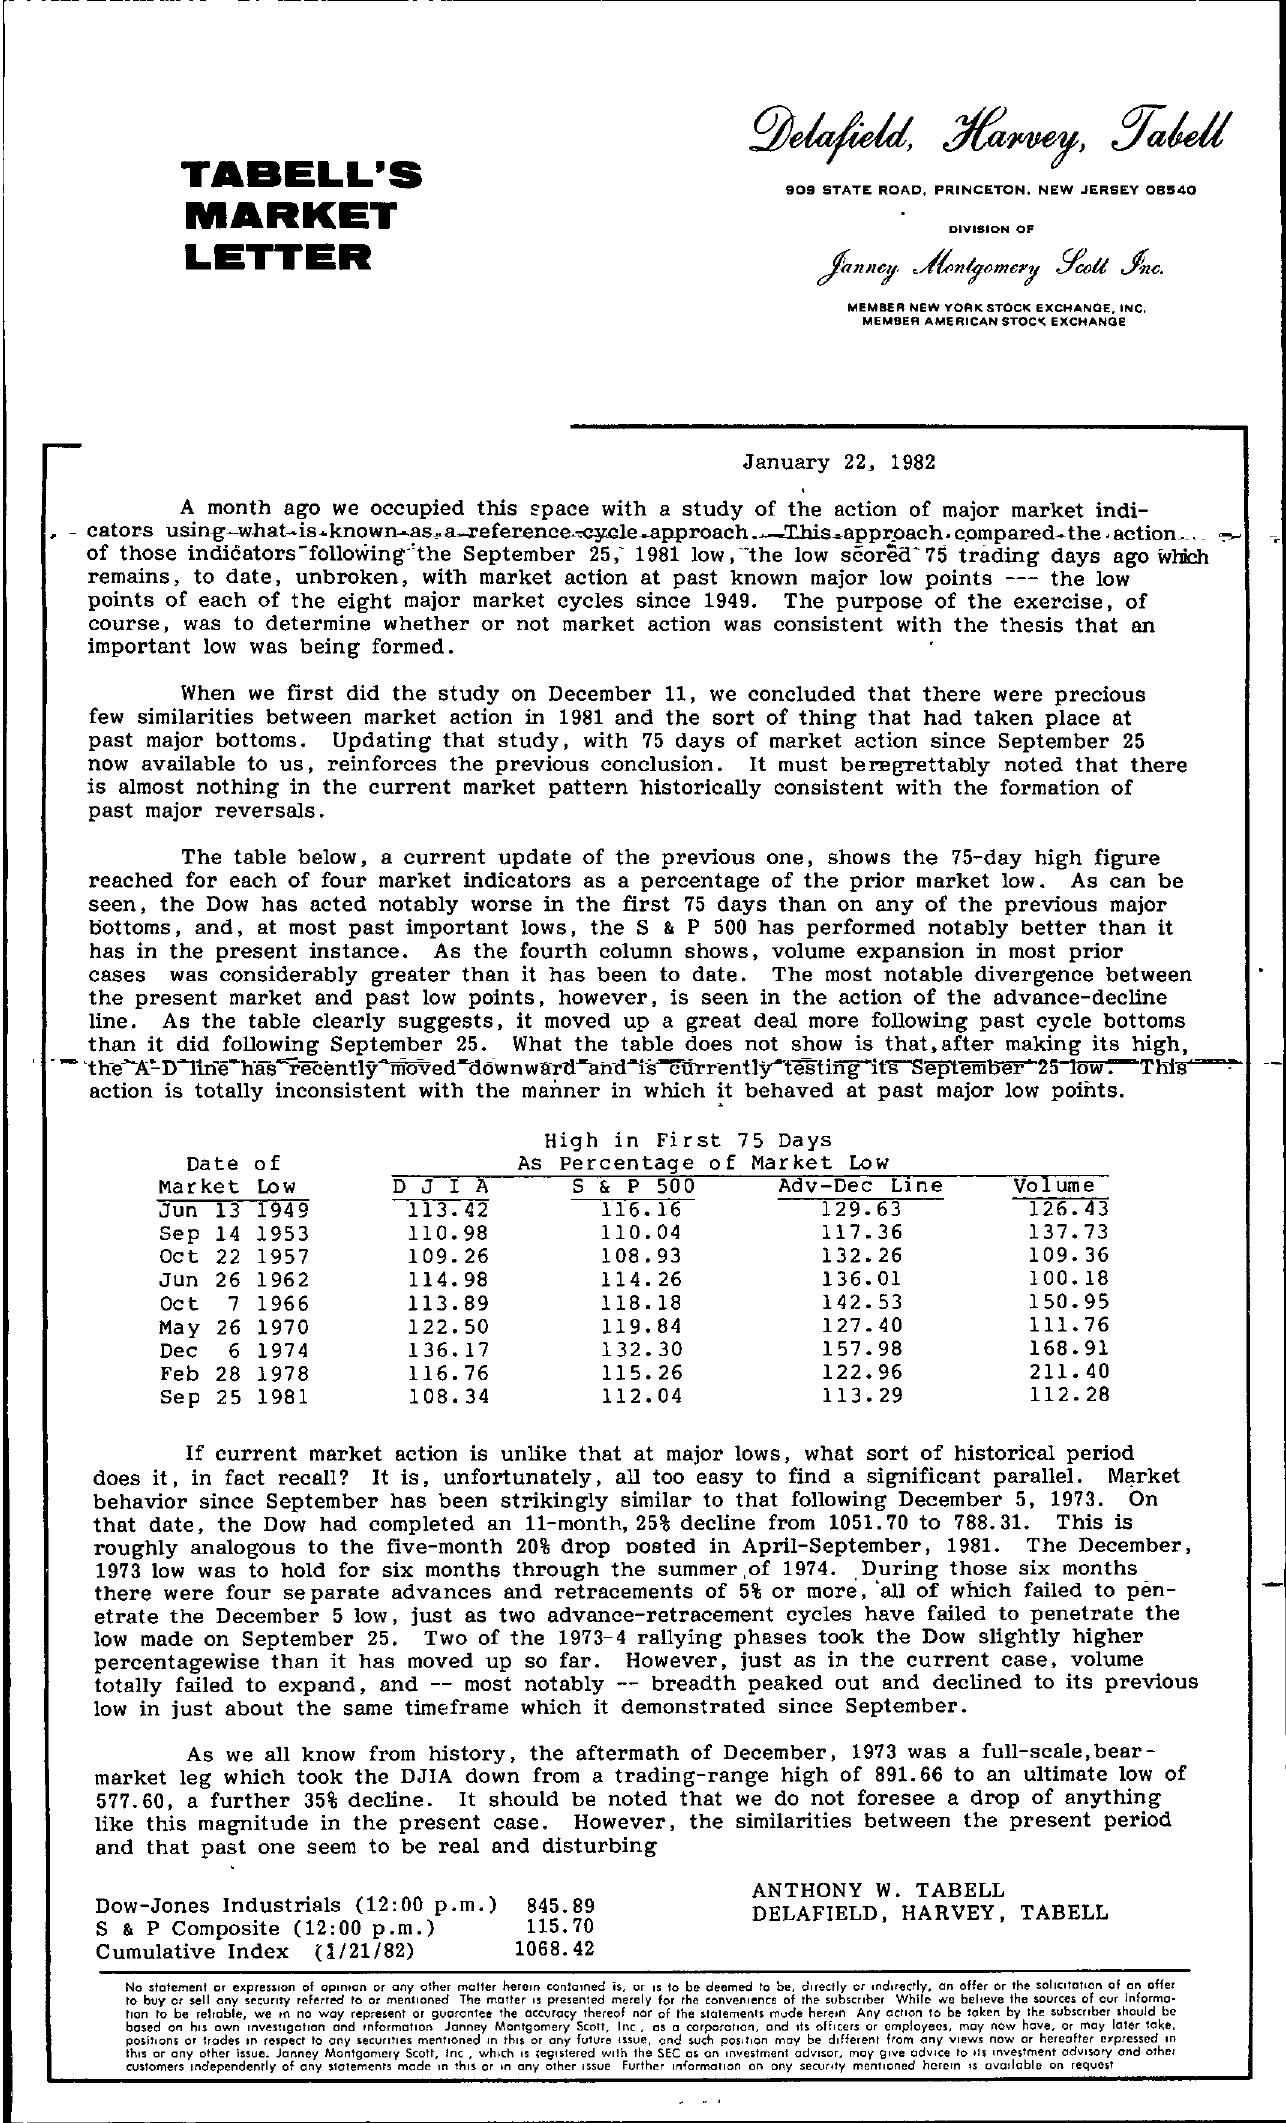 Tabell's Market Letter - January 22, 1982